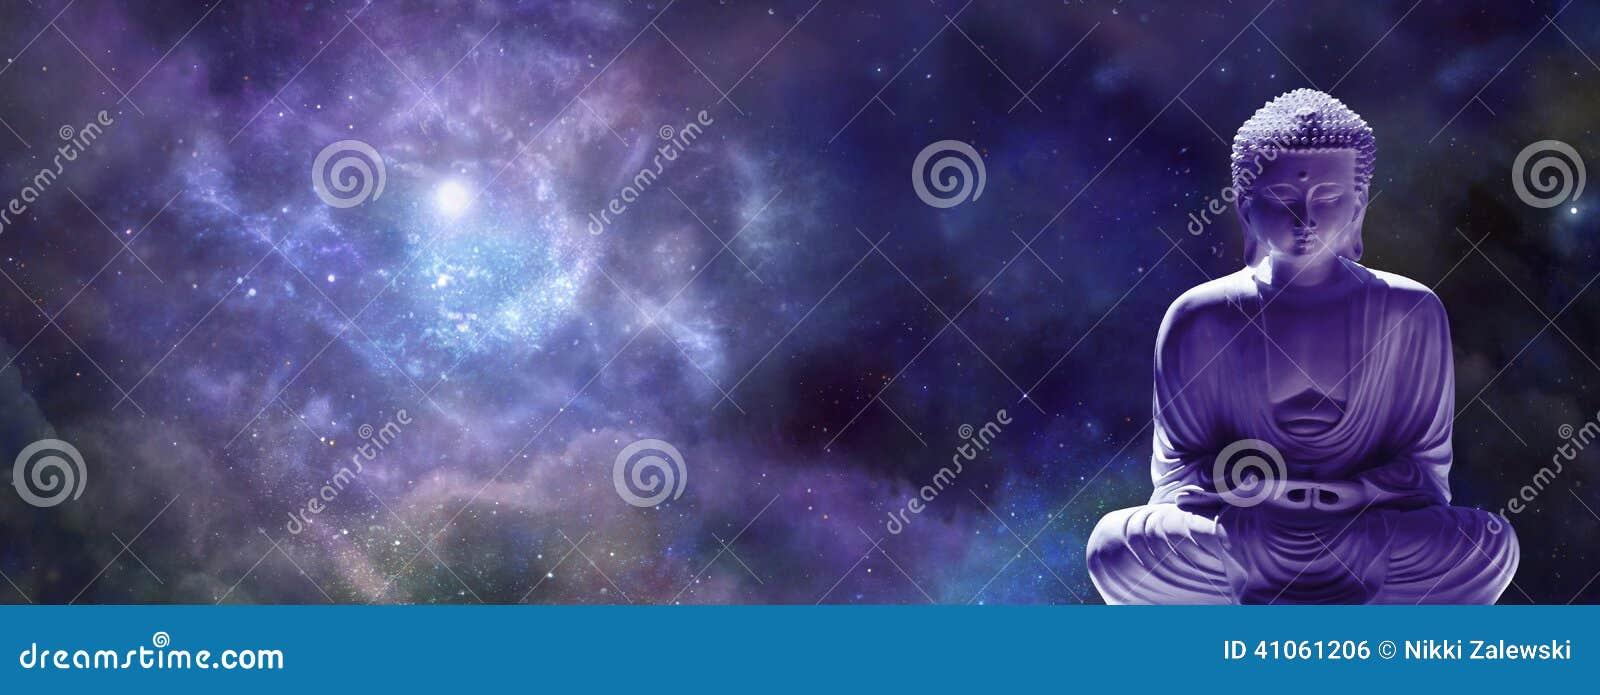 Universal Meditating Buddha web banner